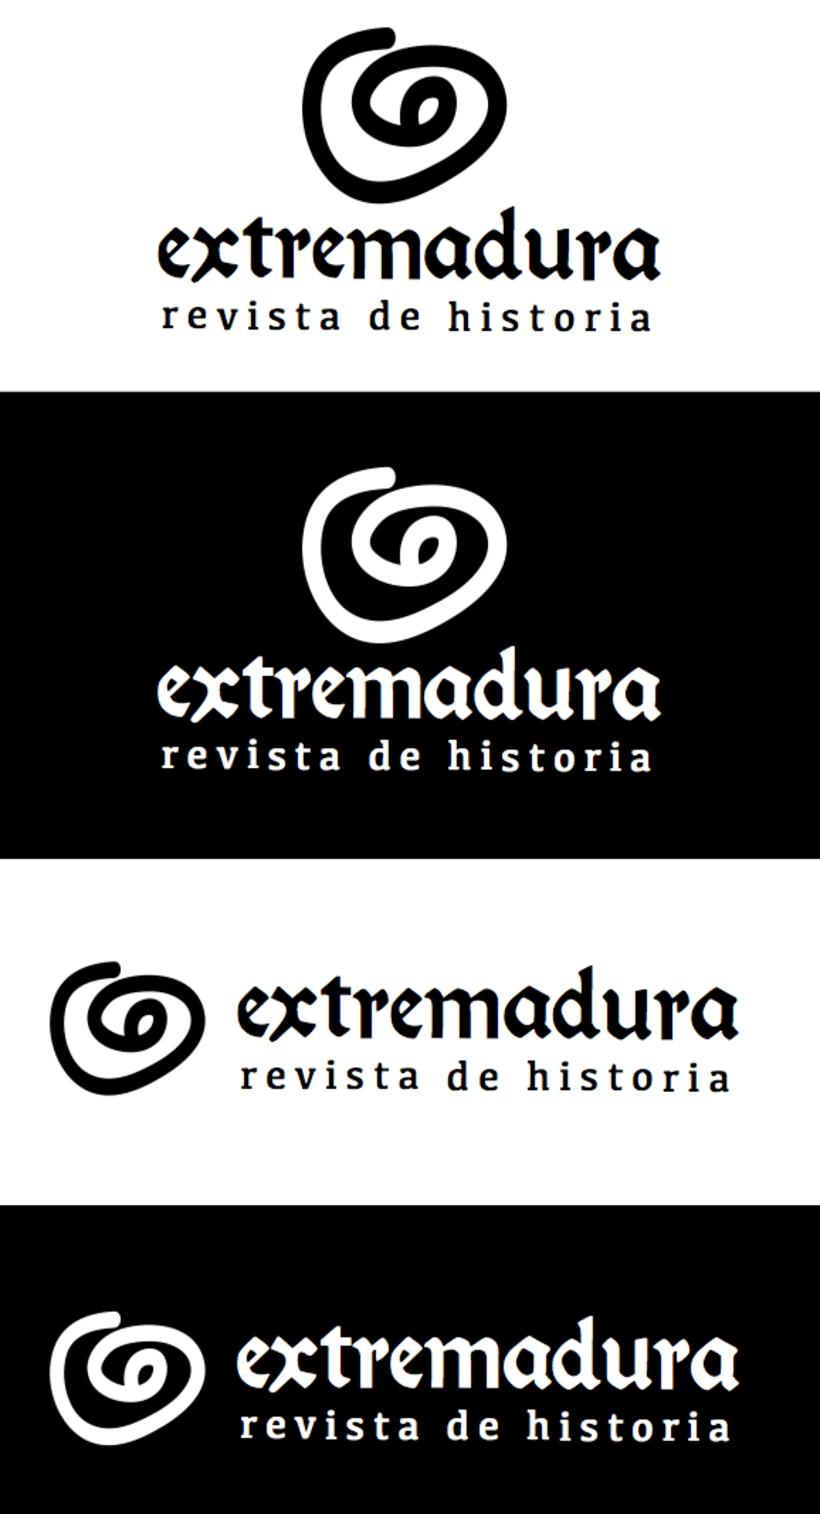 Extremadura Revista de historia -1